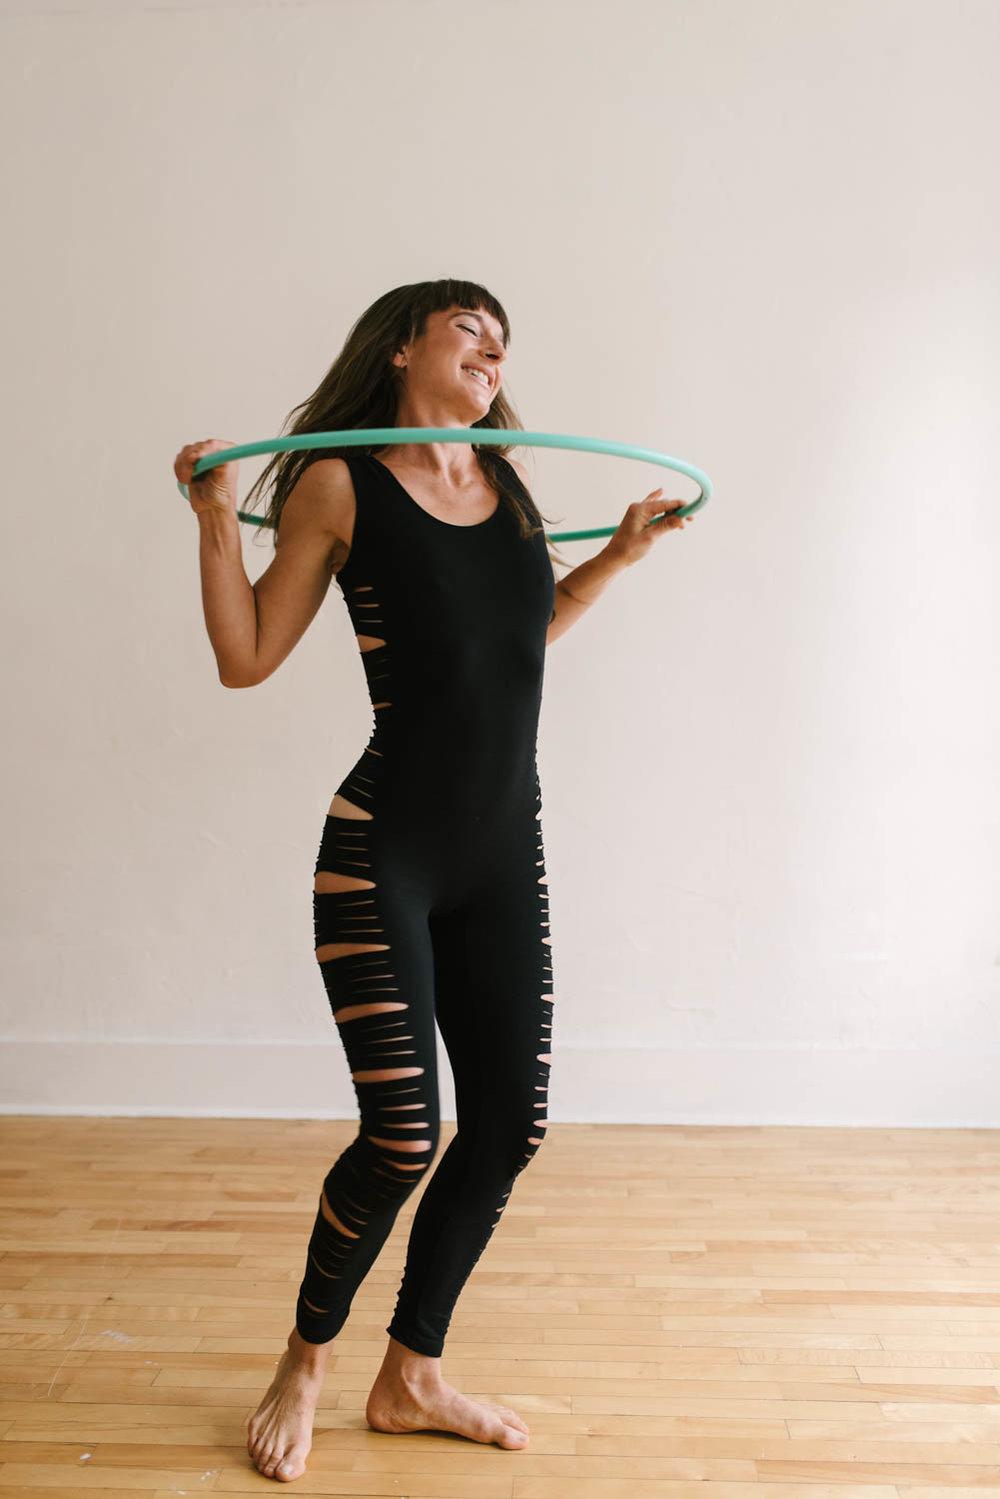 woman-with-hula-hoop-color-©Copyright-Elisabeth-Waller.jpg